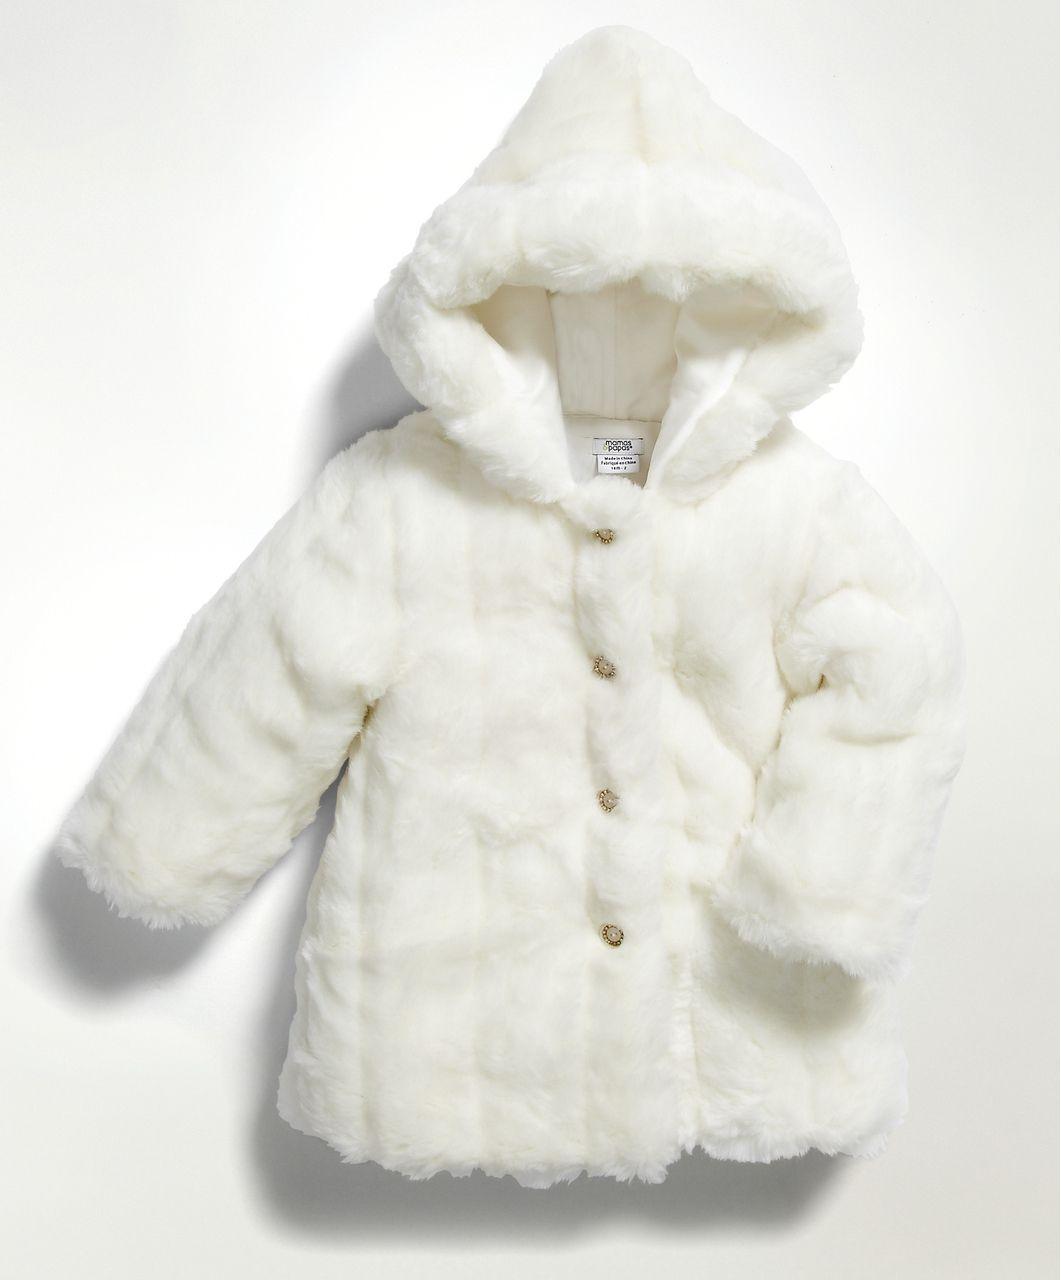 c45dac7cb Girls Cream Faux Fur Coat - Cardigans   Jackets - Mamas   Papas ...